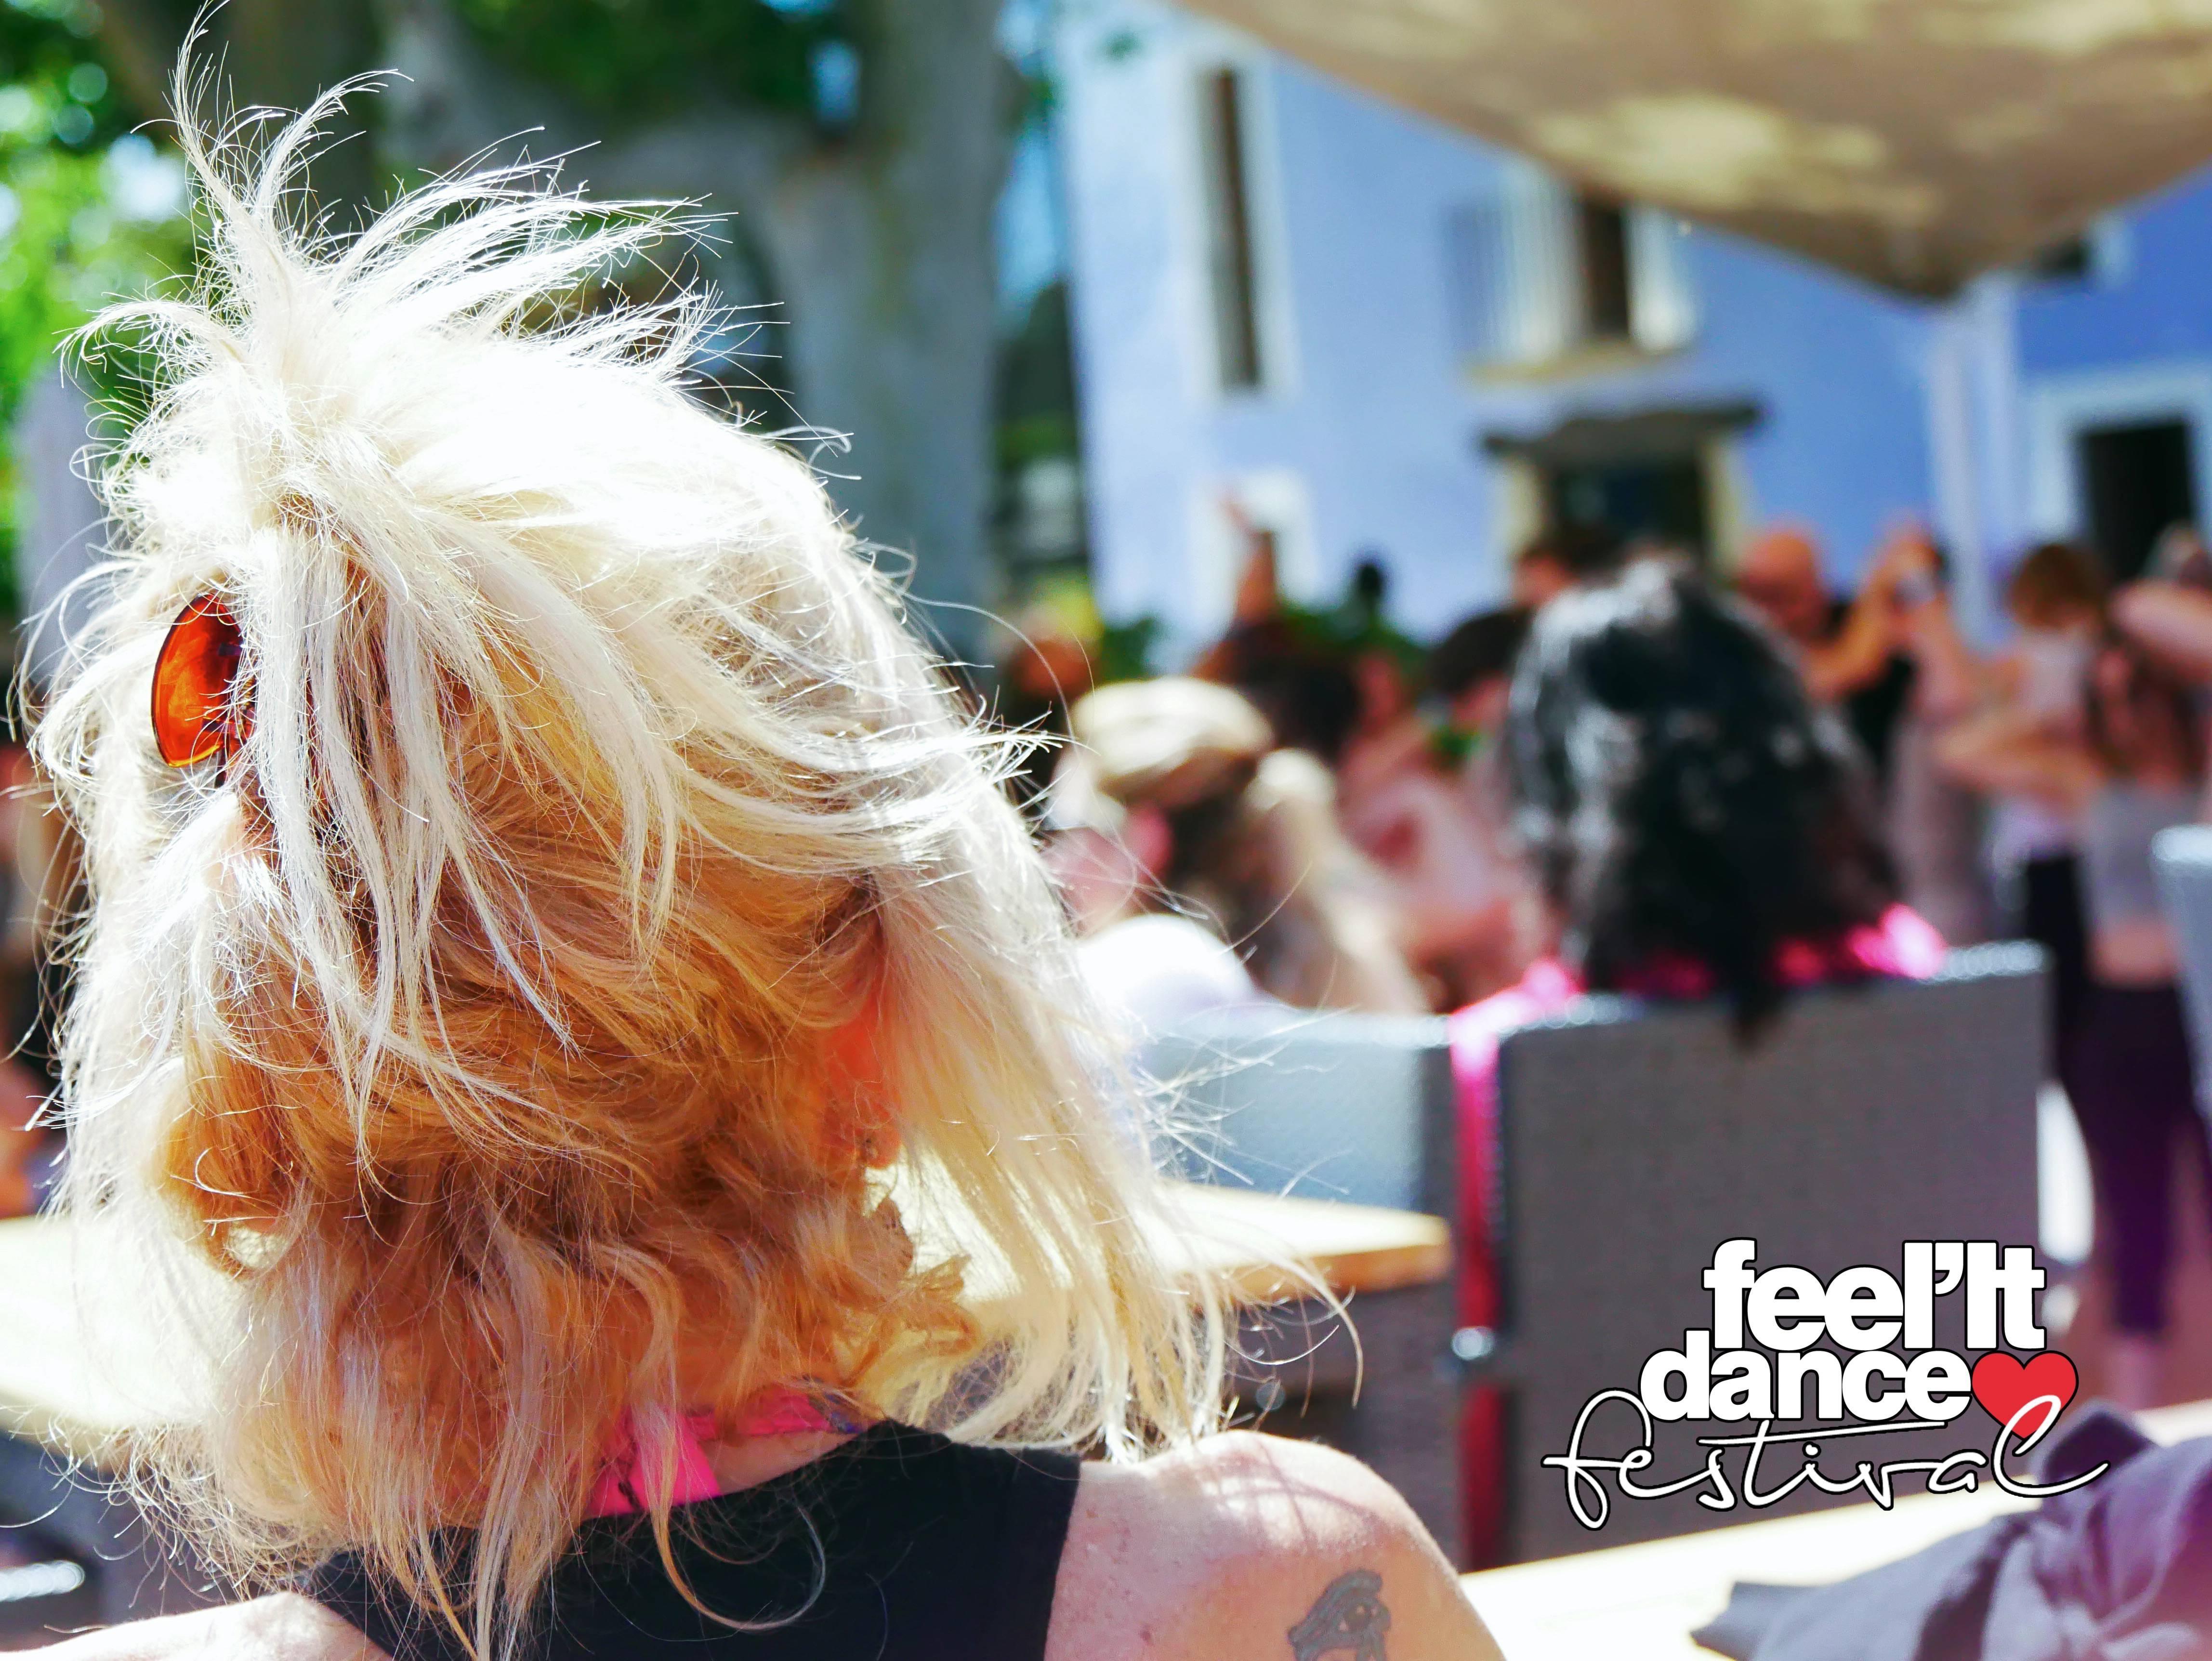 FeelitDanceFestival - 140